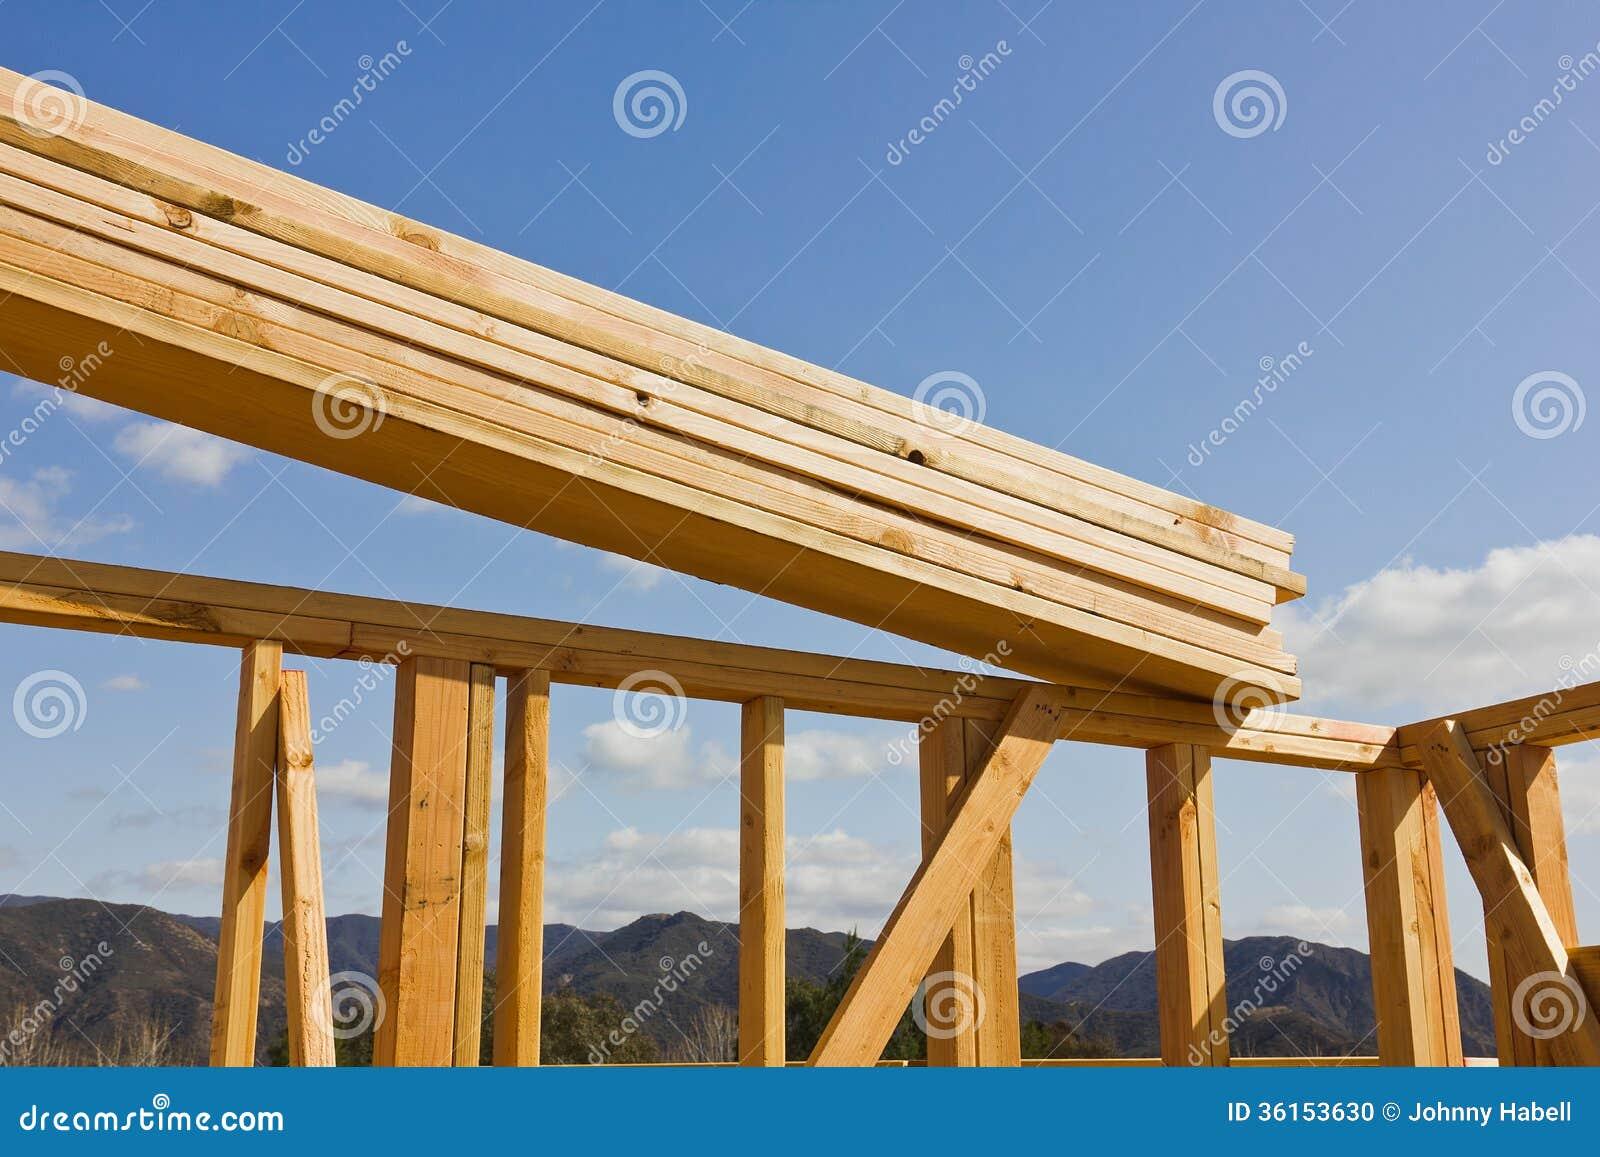 Wood Frame Construction : Wood Frame Construction : Building Wood Frame Construction